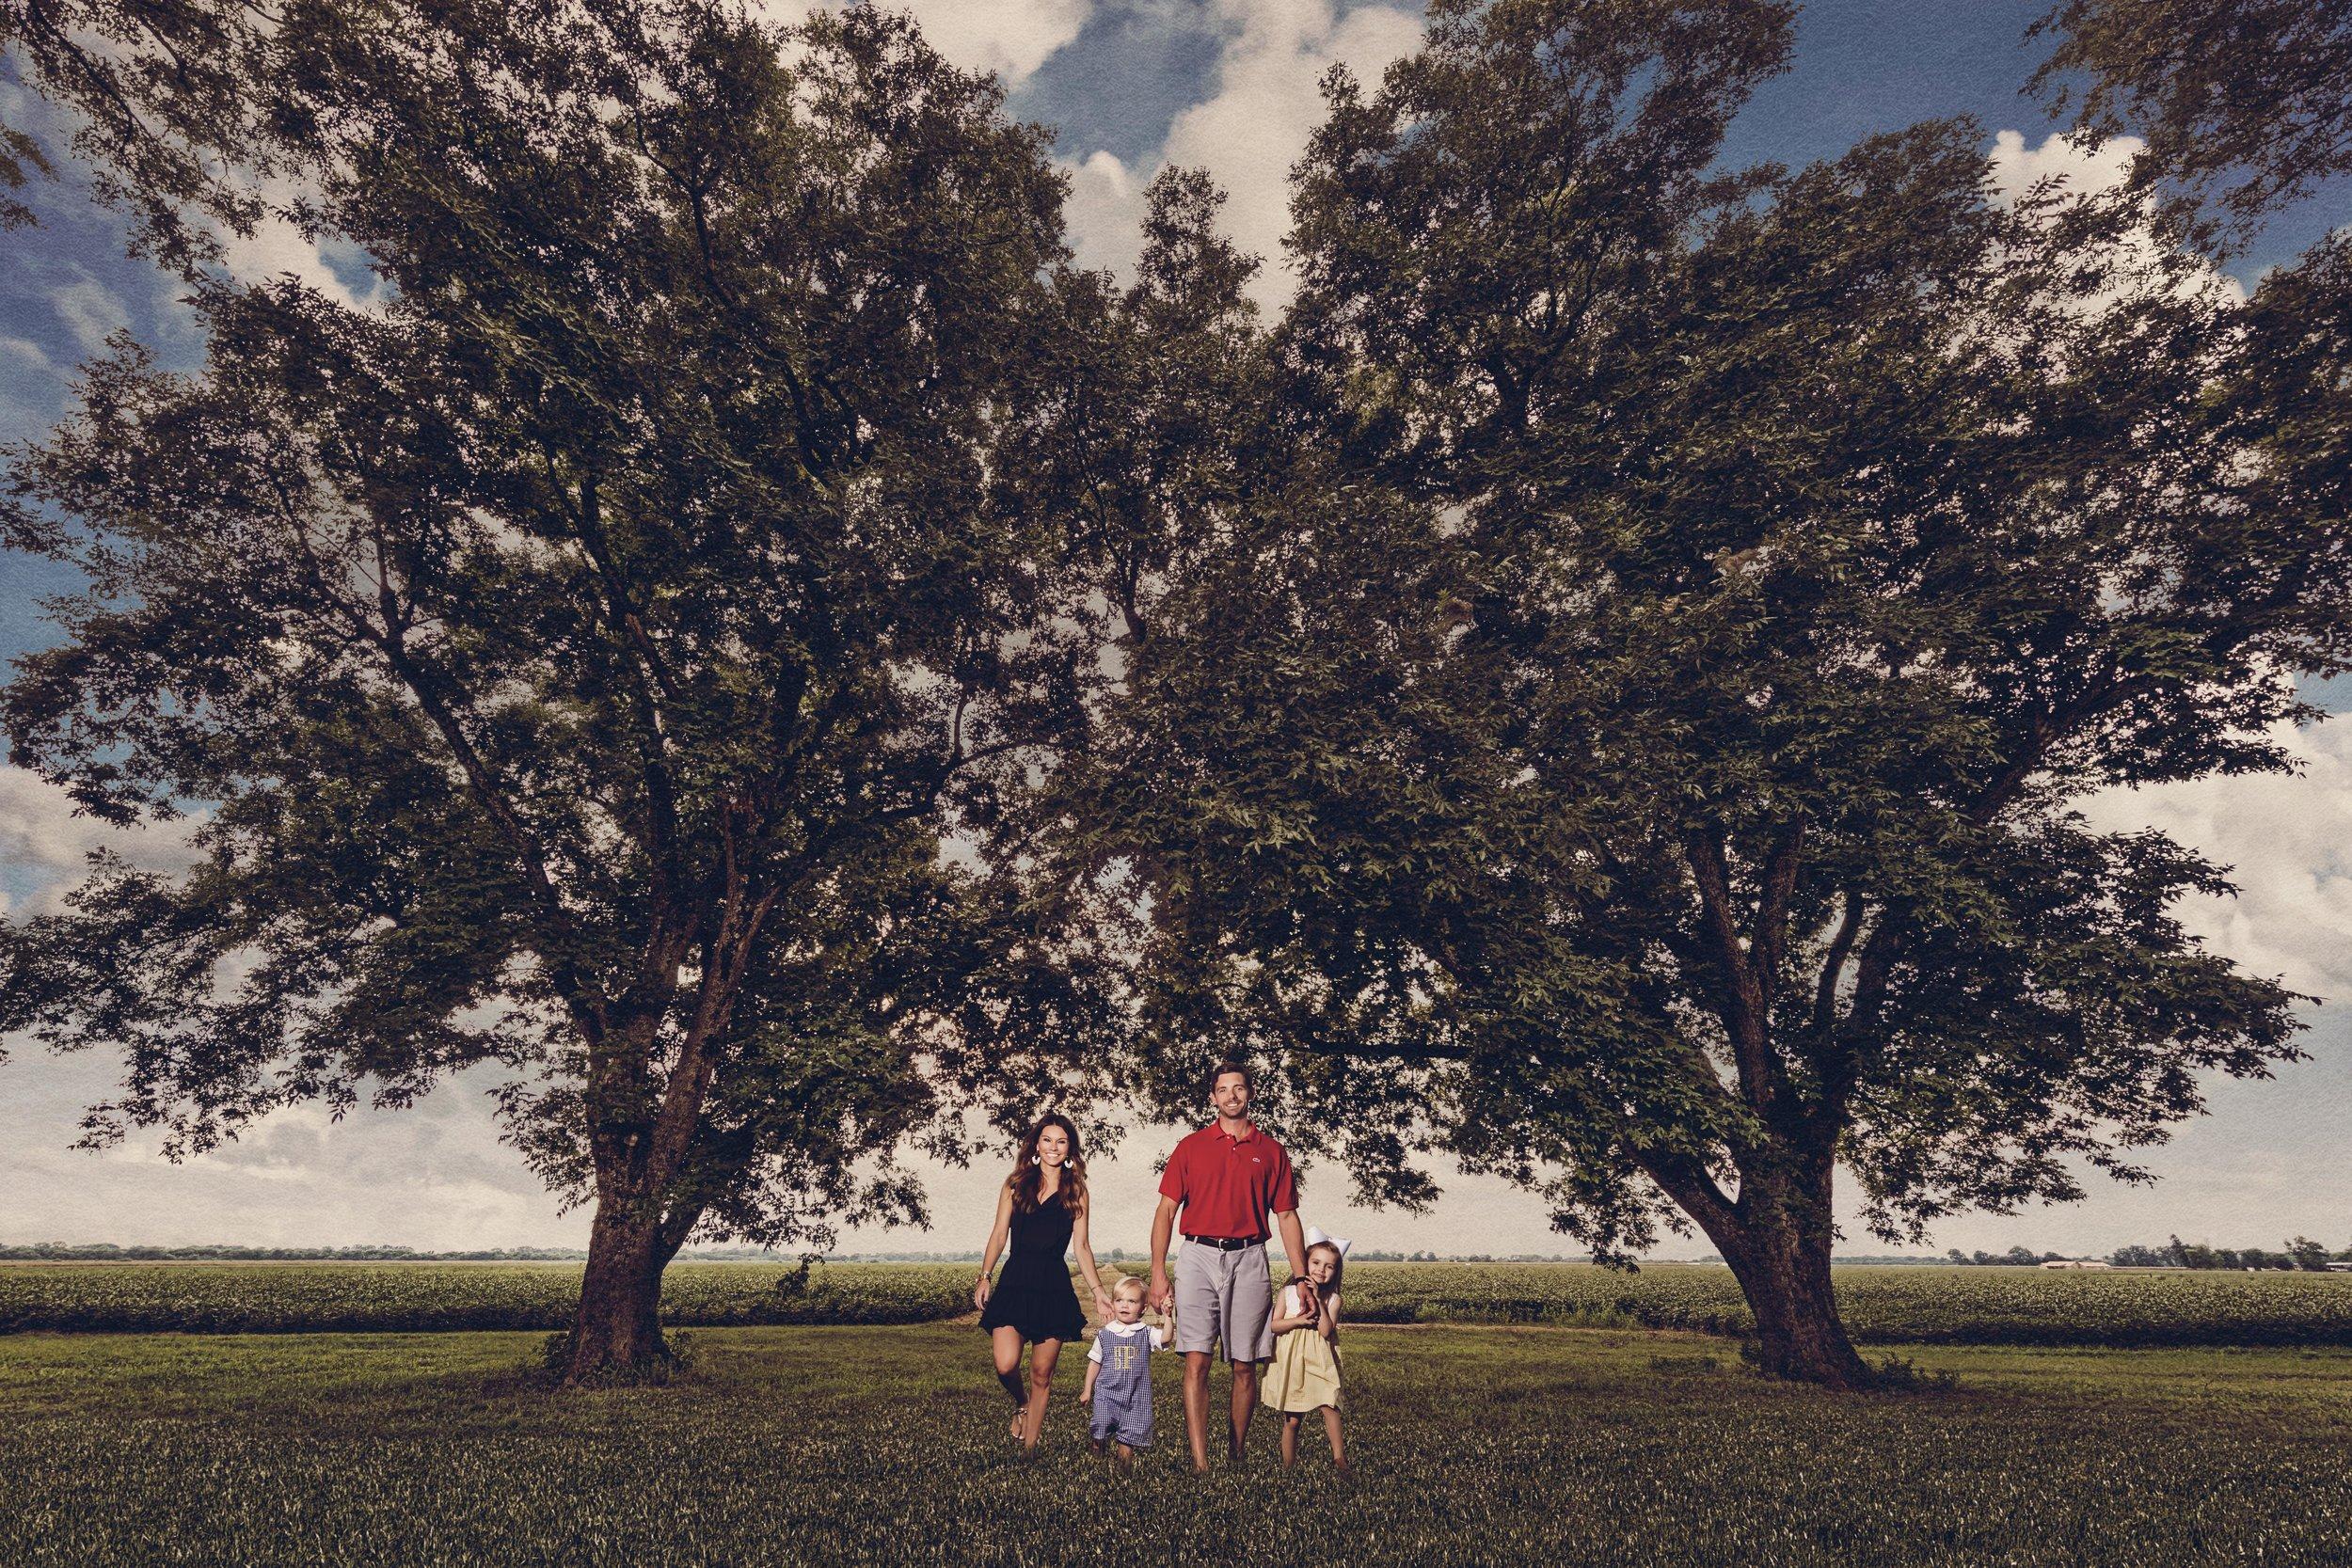 jodie-kelly-family-photography-central-arkansas.jpg